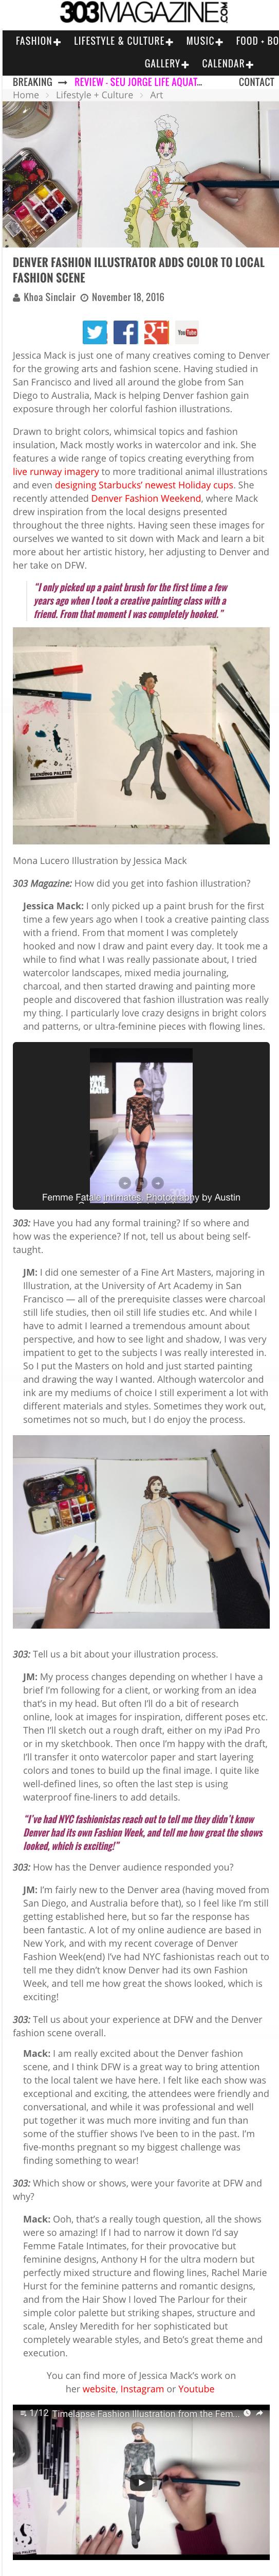 303 Magazine Interview Fashion Illustration Jessica Mack